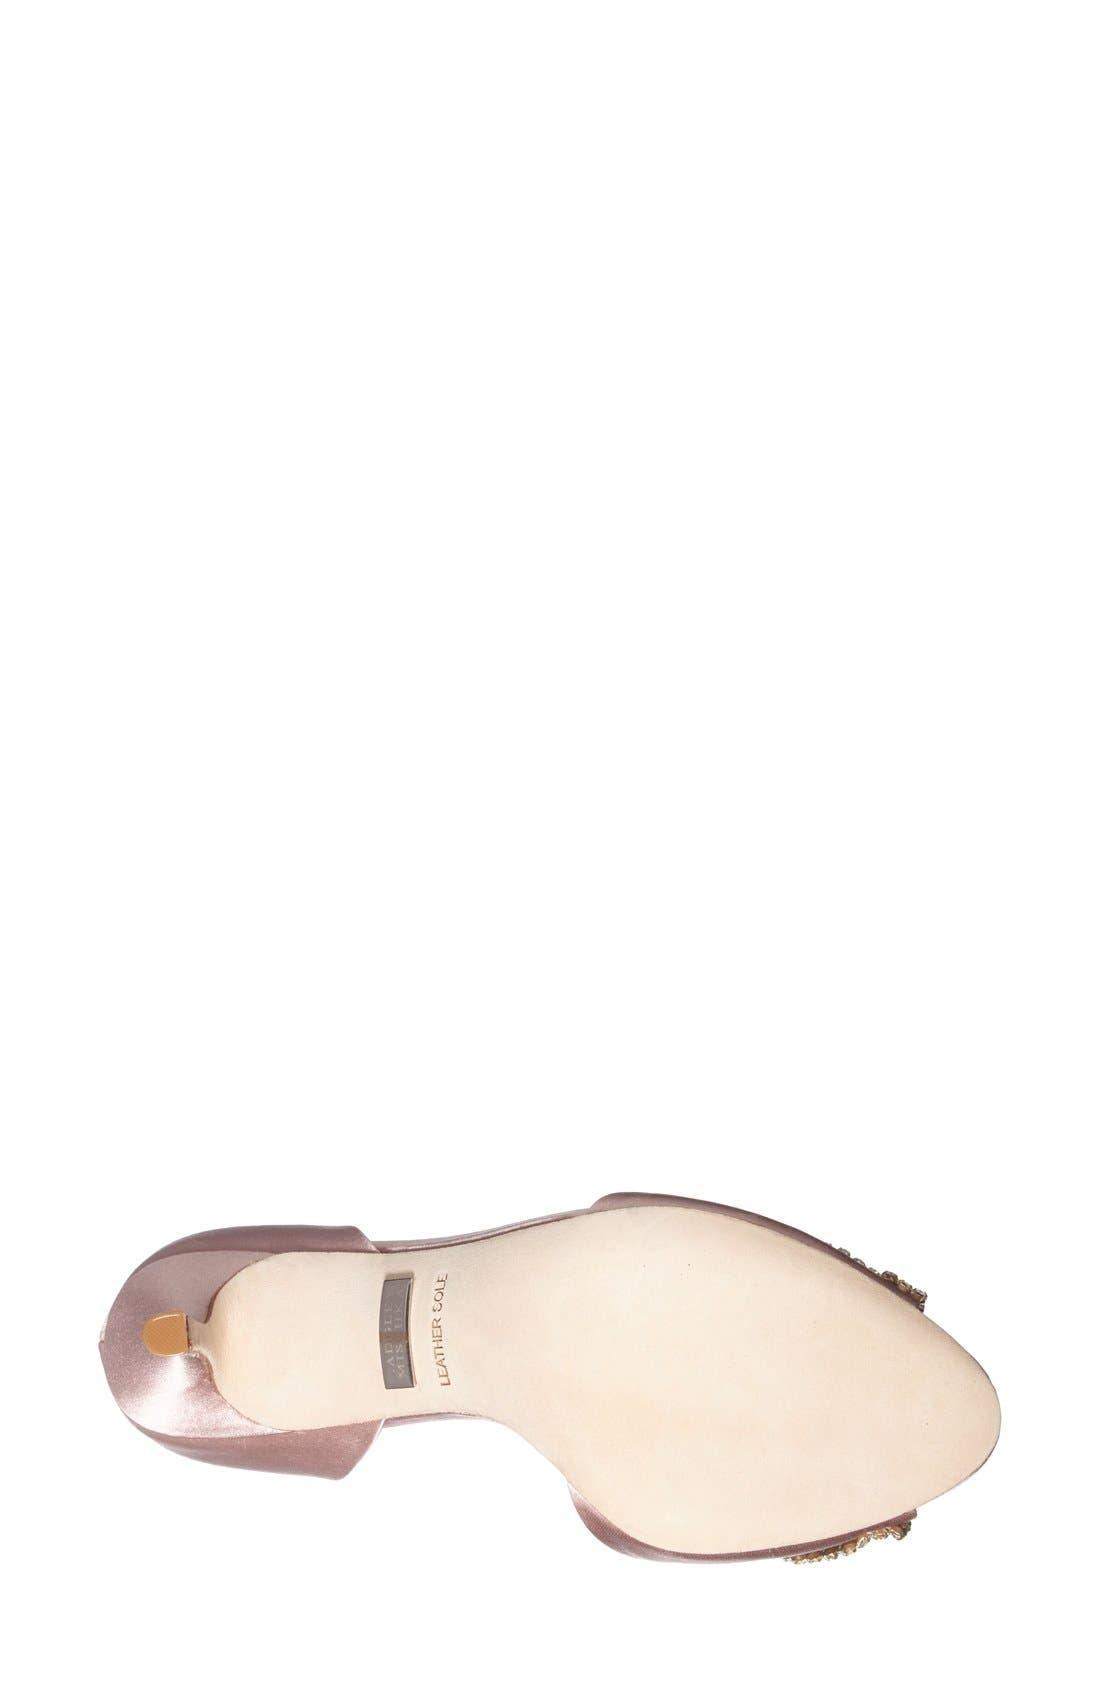 Alternate Image 4  - Badgley Mischka 'Lisbeth' d'Orsay Pump (Women)